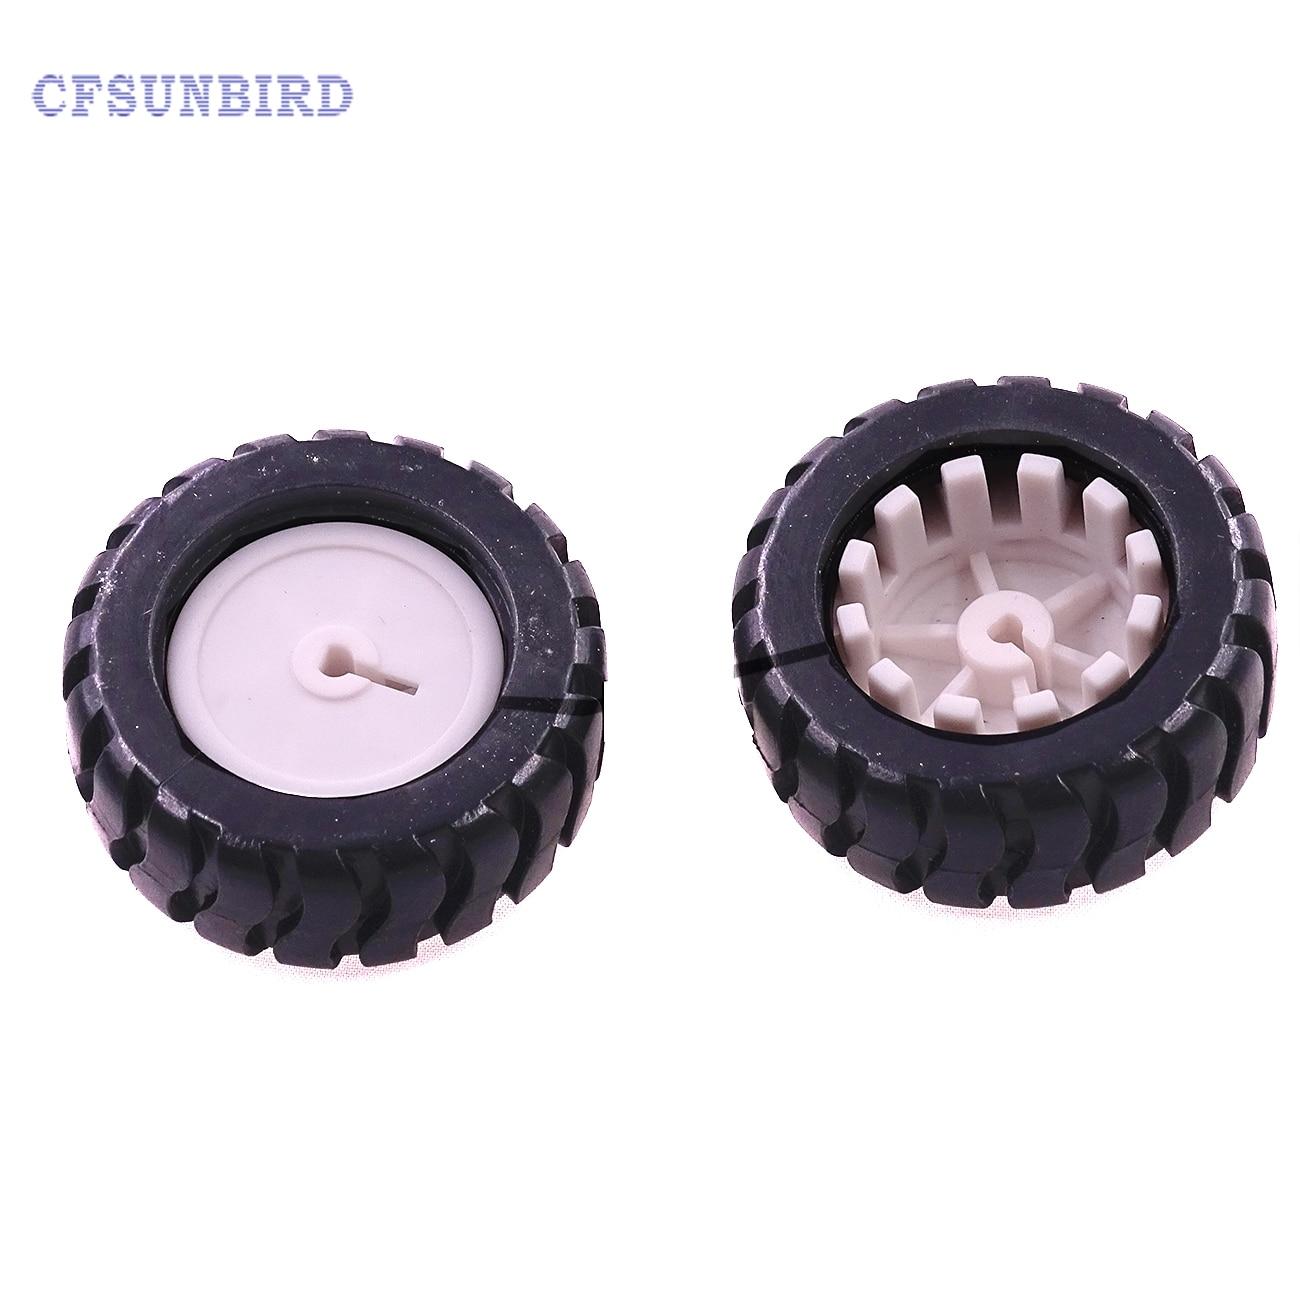 1pcs/lot K346B 43*19*3mm D-hole Rubber Wheel Suitable for N20 Motor D Shaft Tire Car Robot DIY Toys Parts соска pigeon b 345 b 346 b347 sml